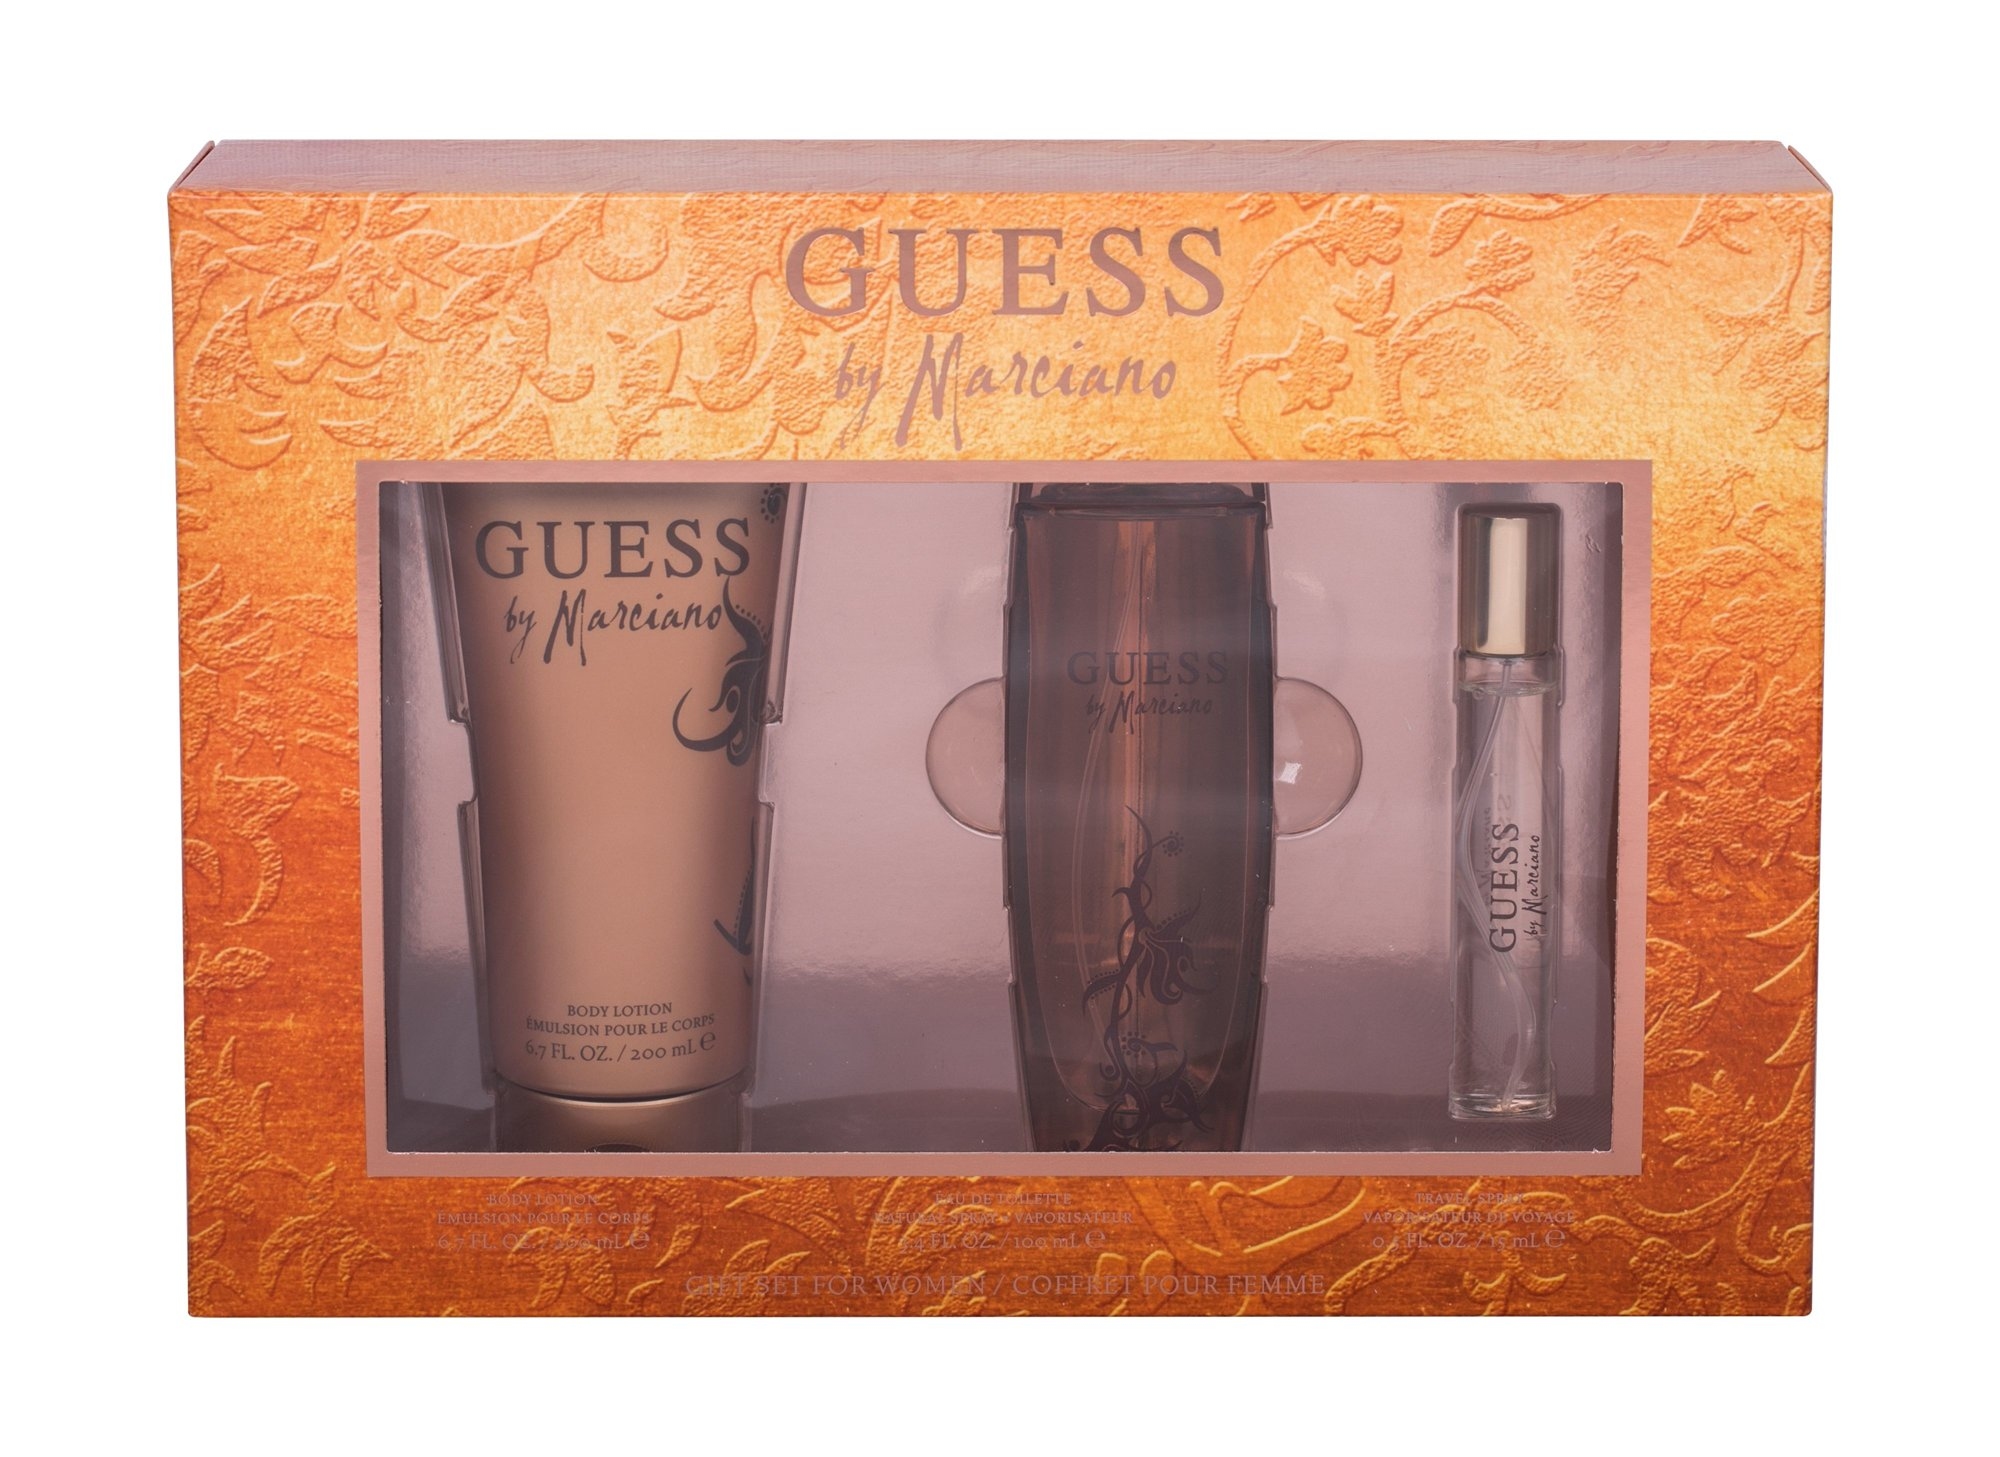 GUESS Guess by Marciano Eau de Toilette 100ml